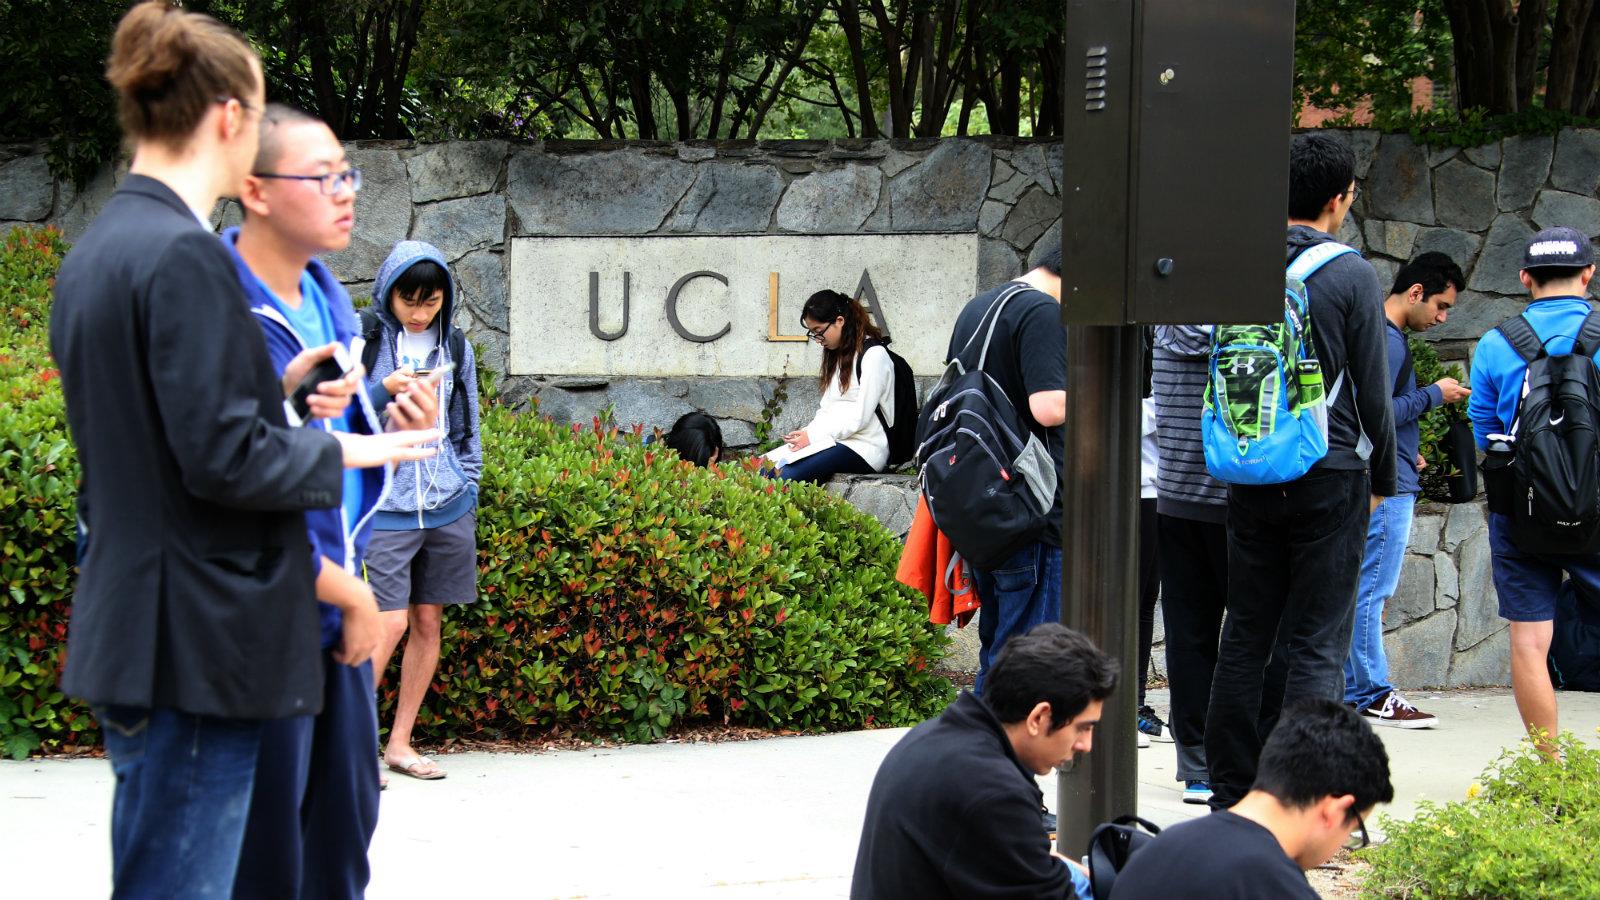 UCLA-firing